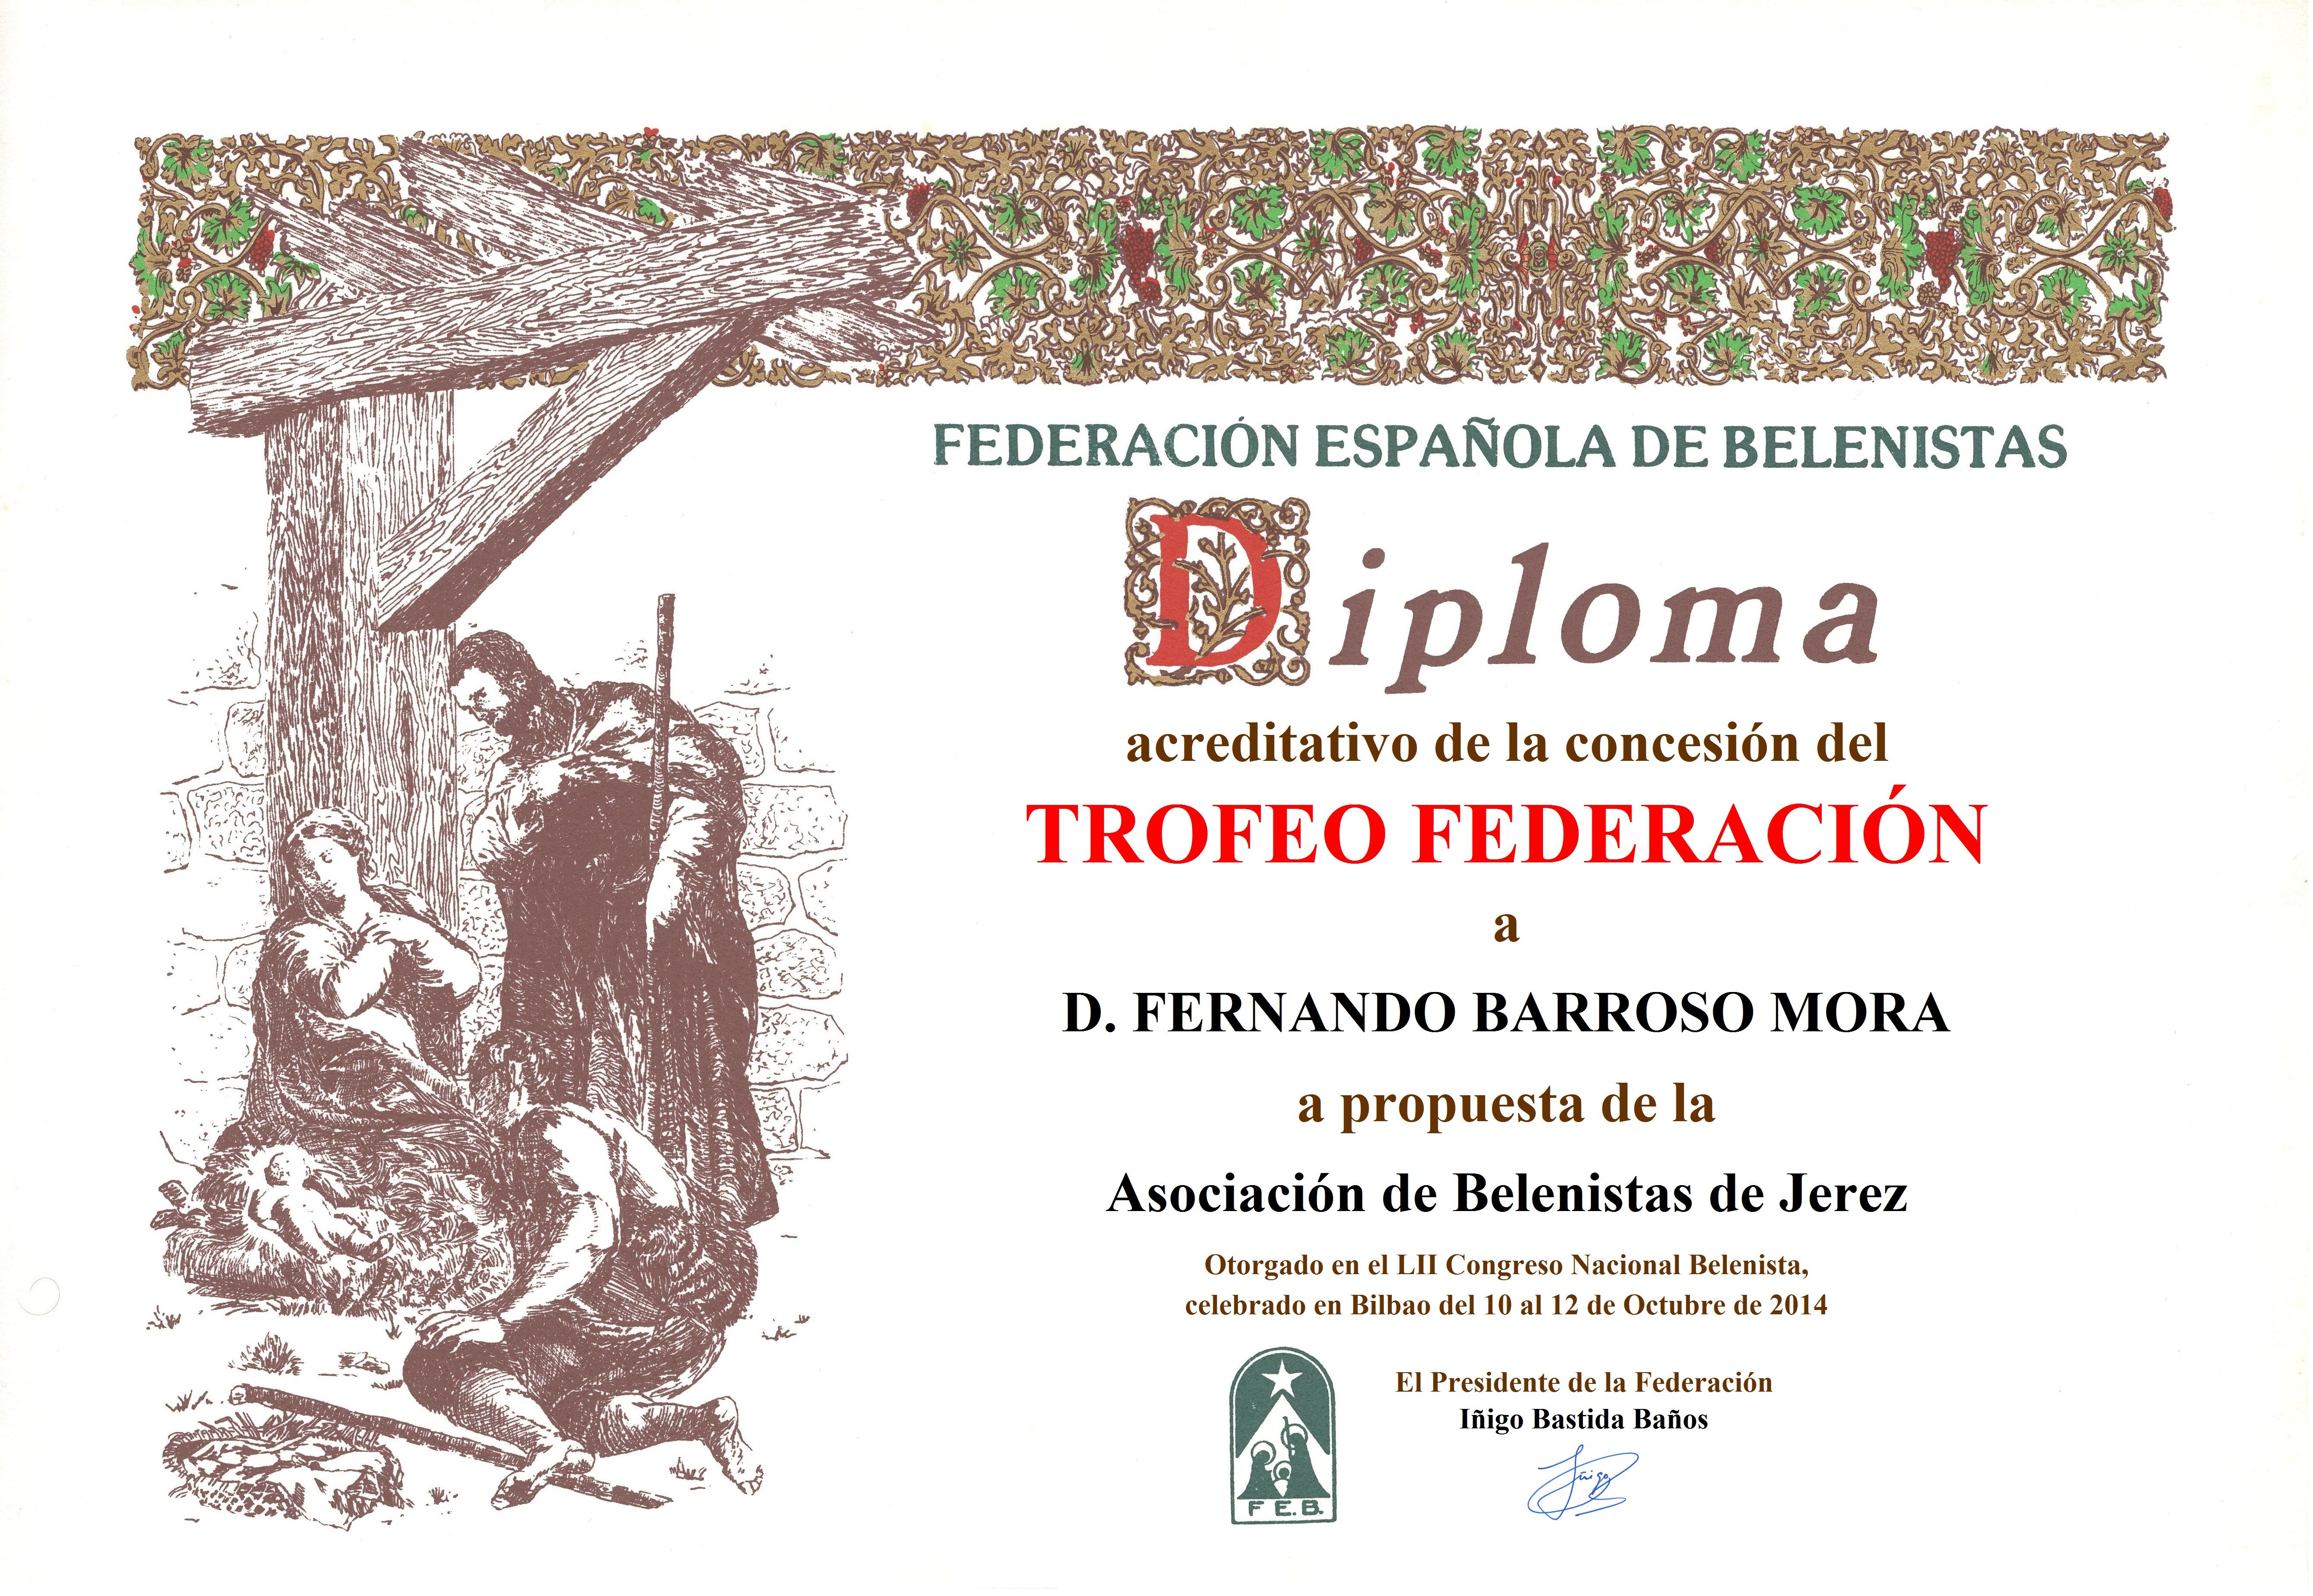 Diploma Trofeo FEB 2014 Fernando Barroso Mora